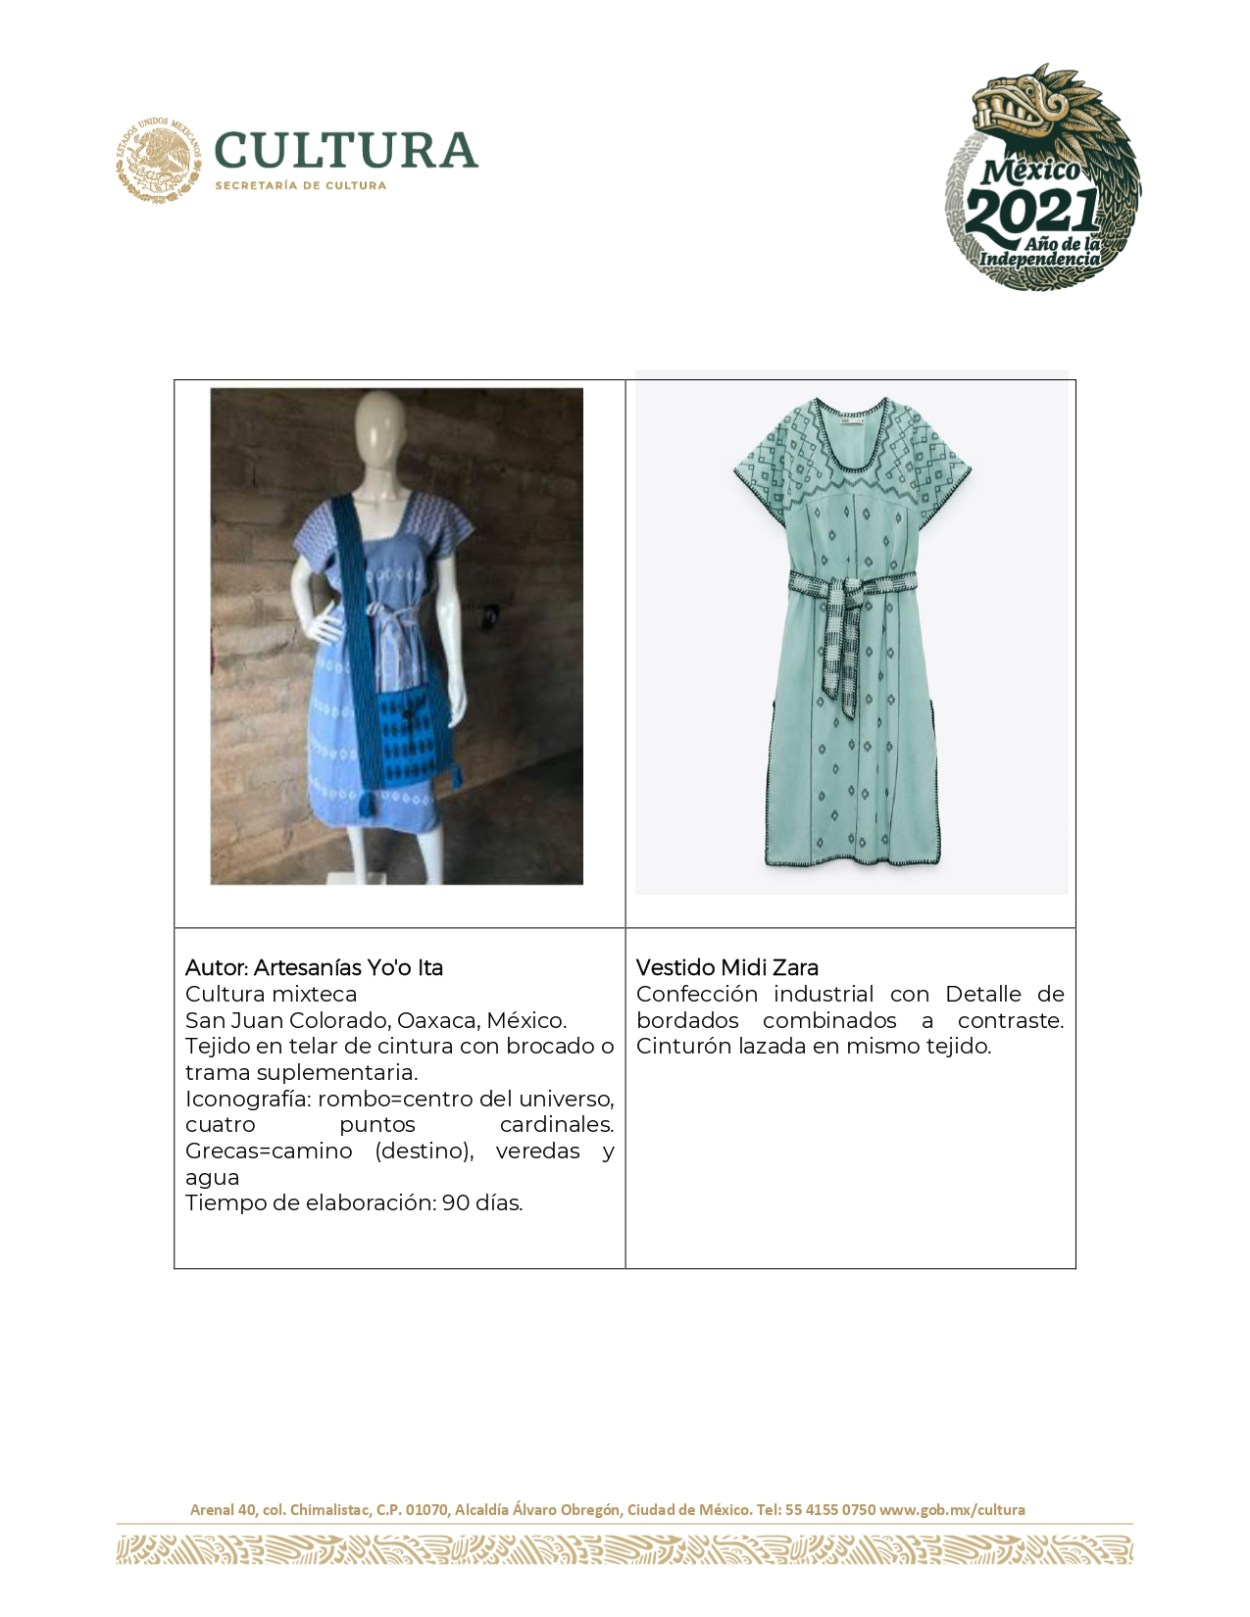 /cms/uploads/image/file/650310/3..Carta_de_extran_amiento_Zara_page-0003.jpg